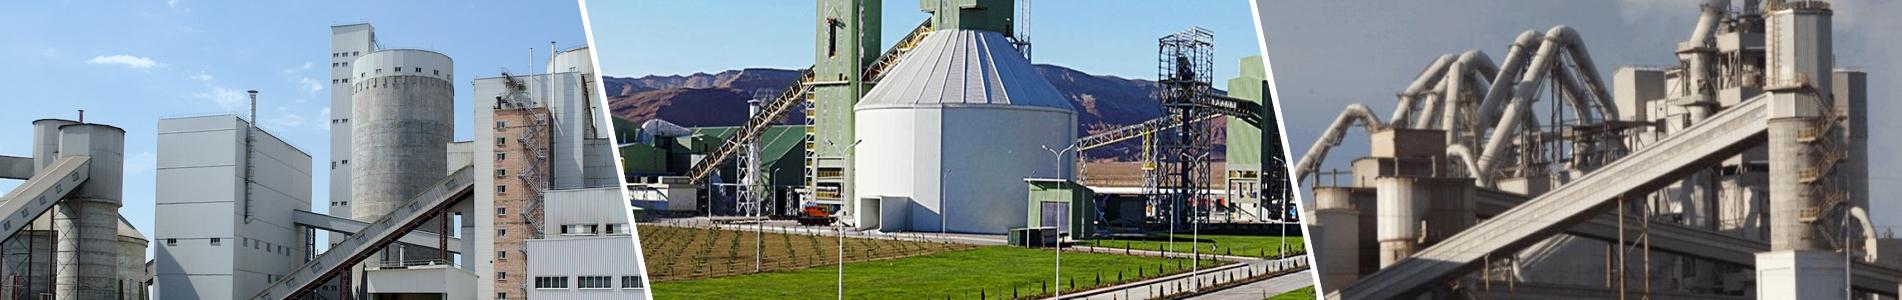 AIR SLIDE FABRICS, Leading Industrial Filtration Solution Provider